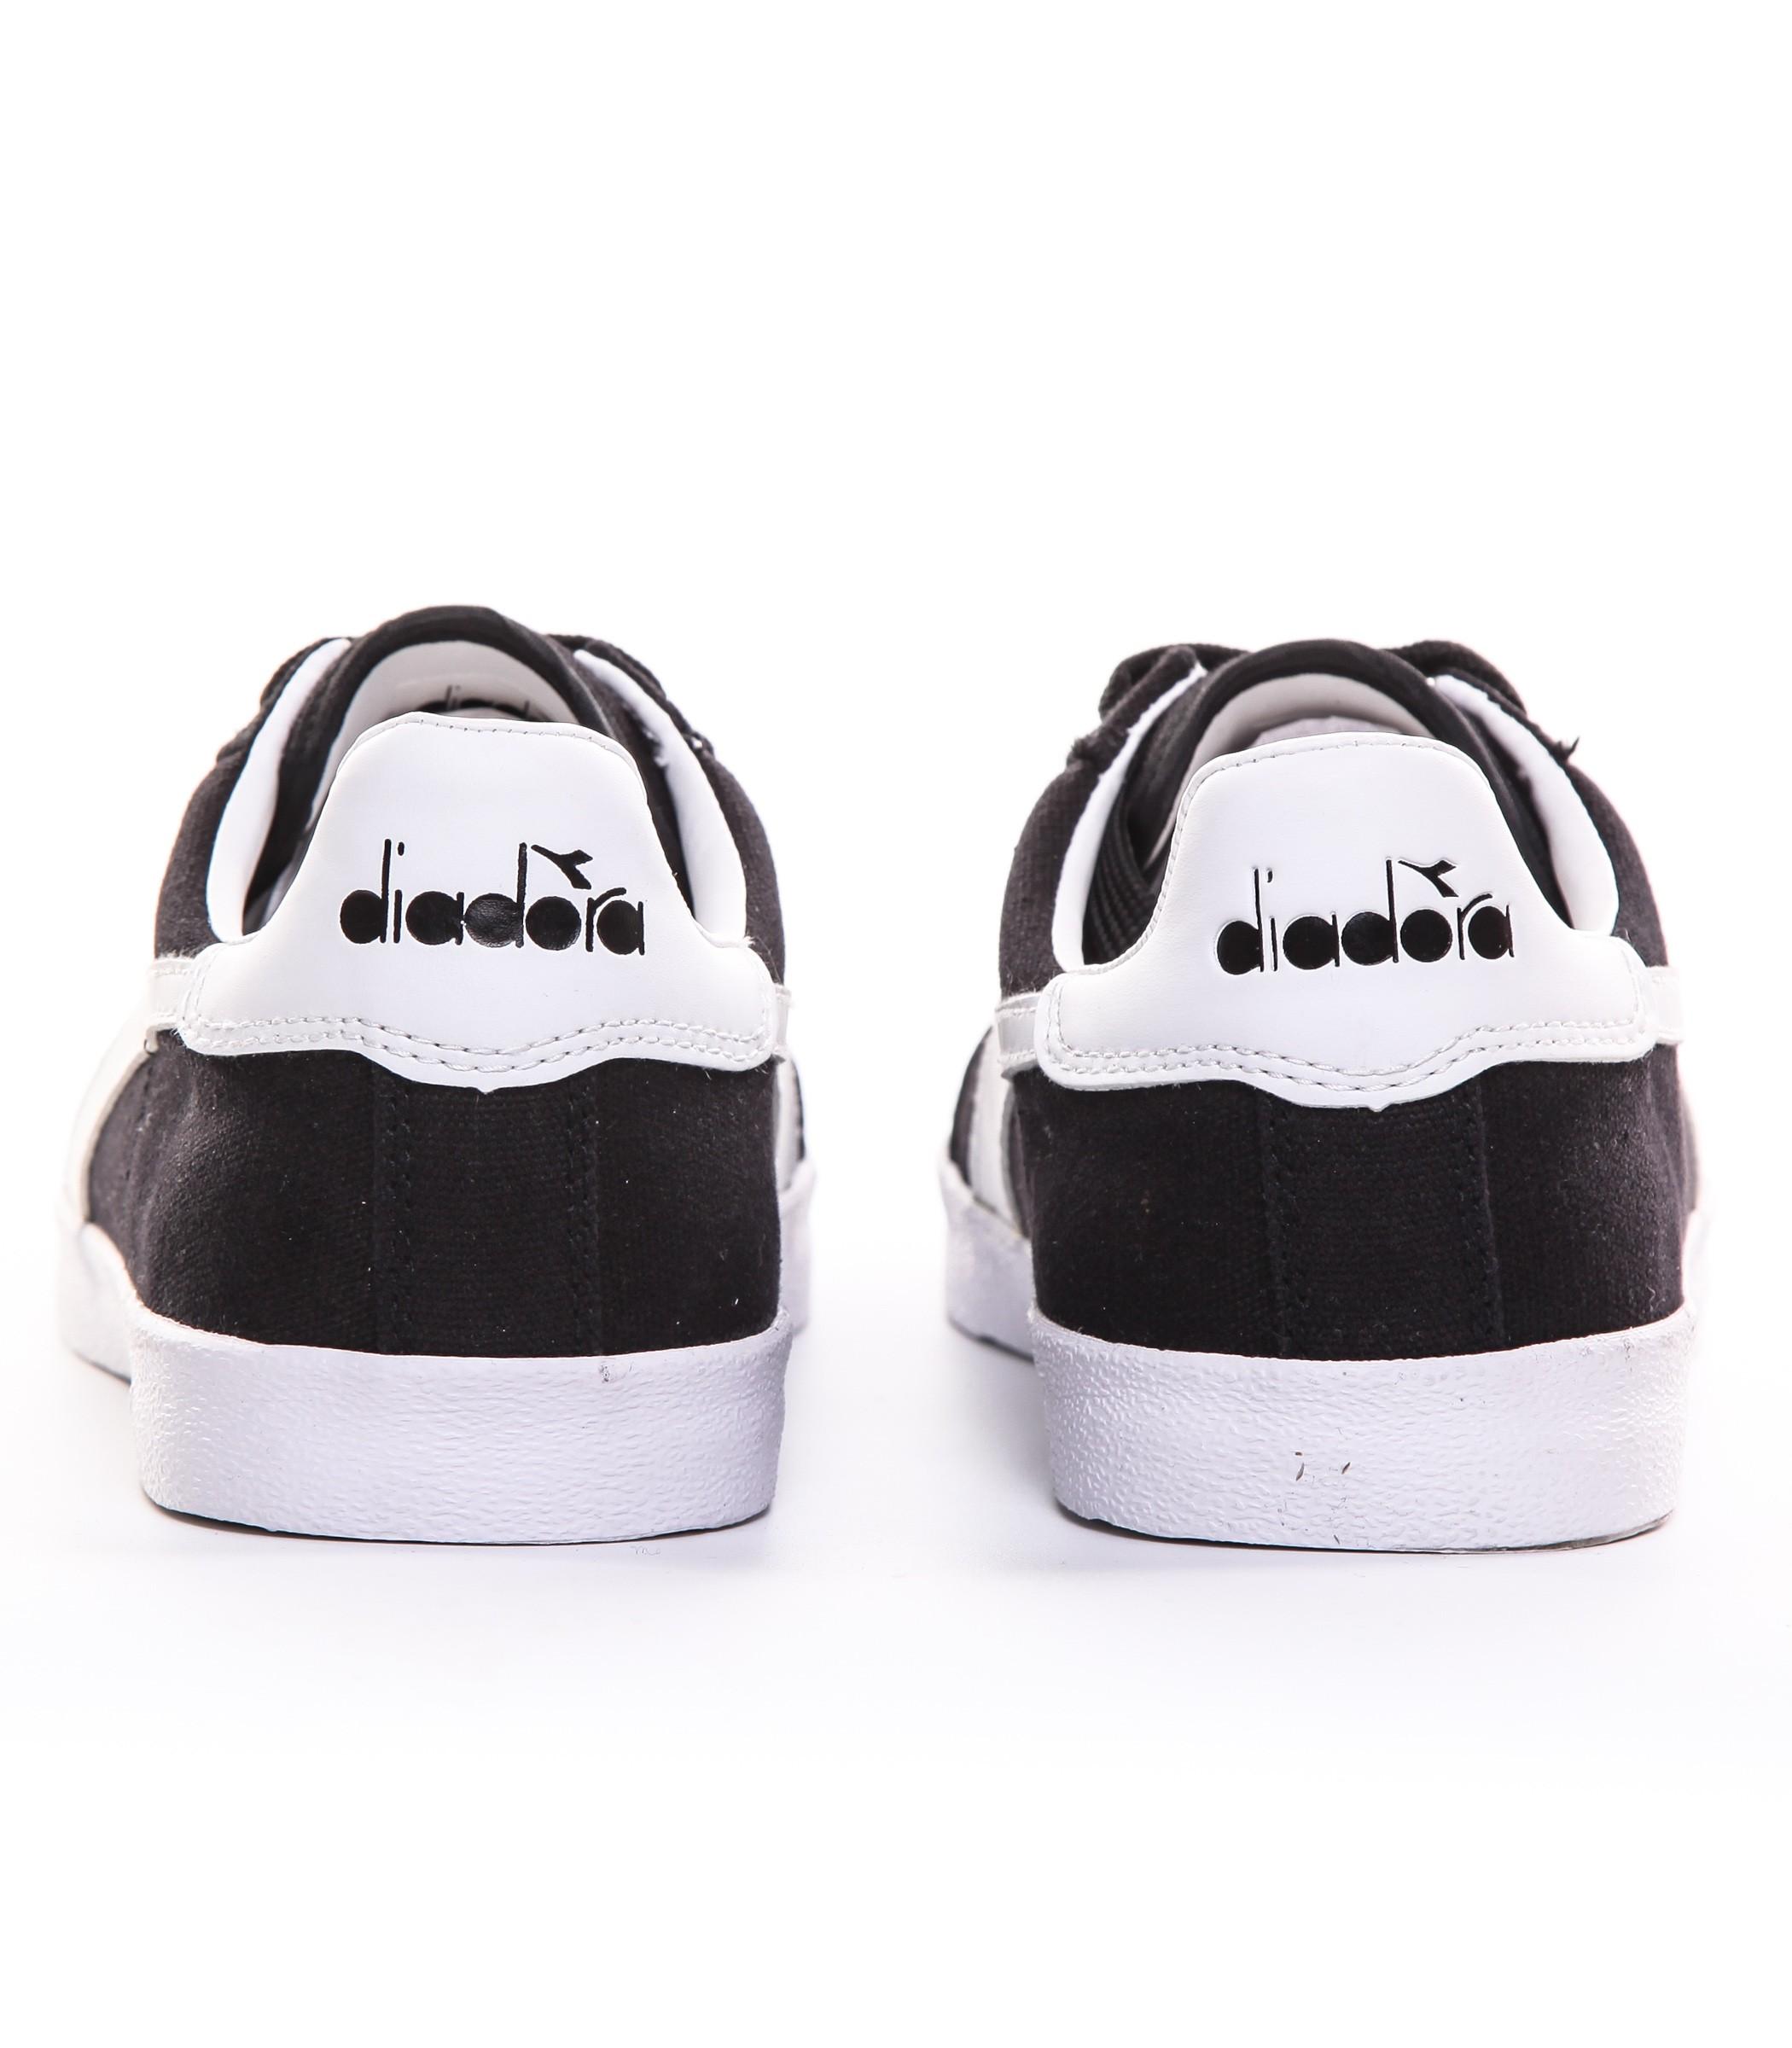 Cv 101 Scarpe Da Uomo Sneakers Pitch 174375 Rif Diadora qwwZfg